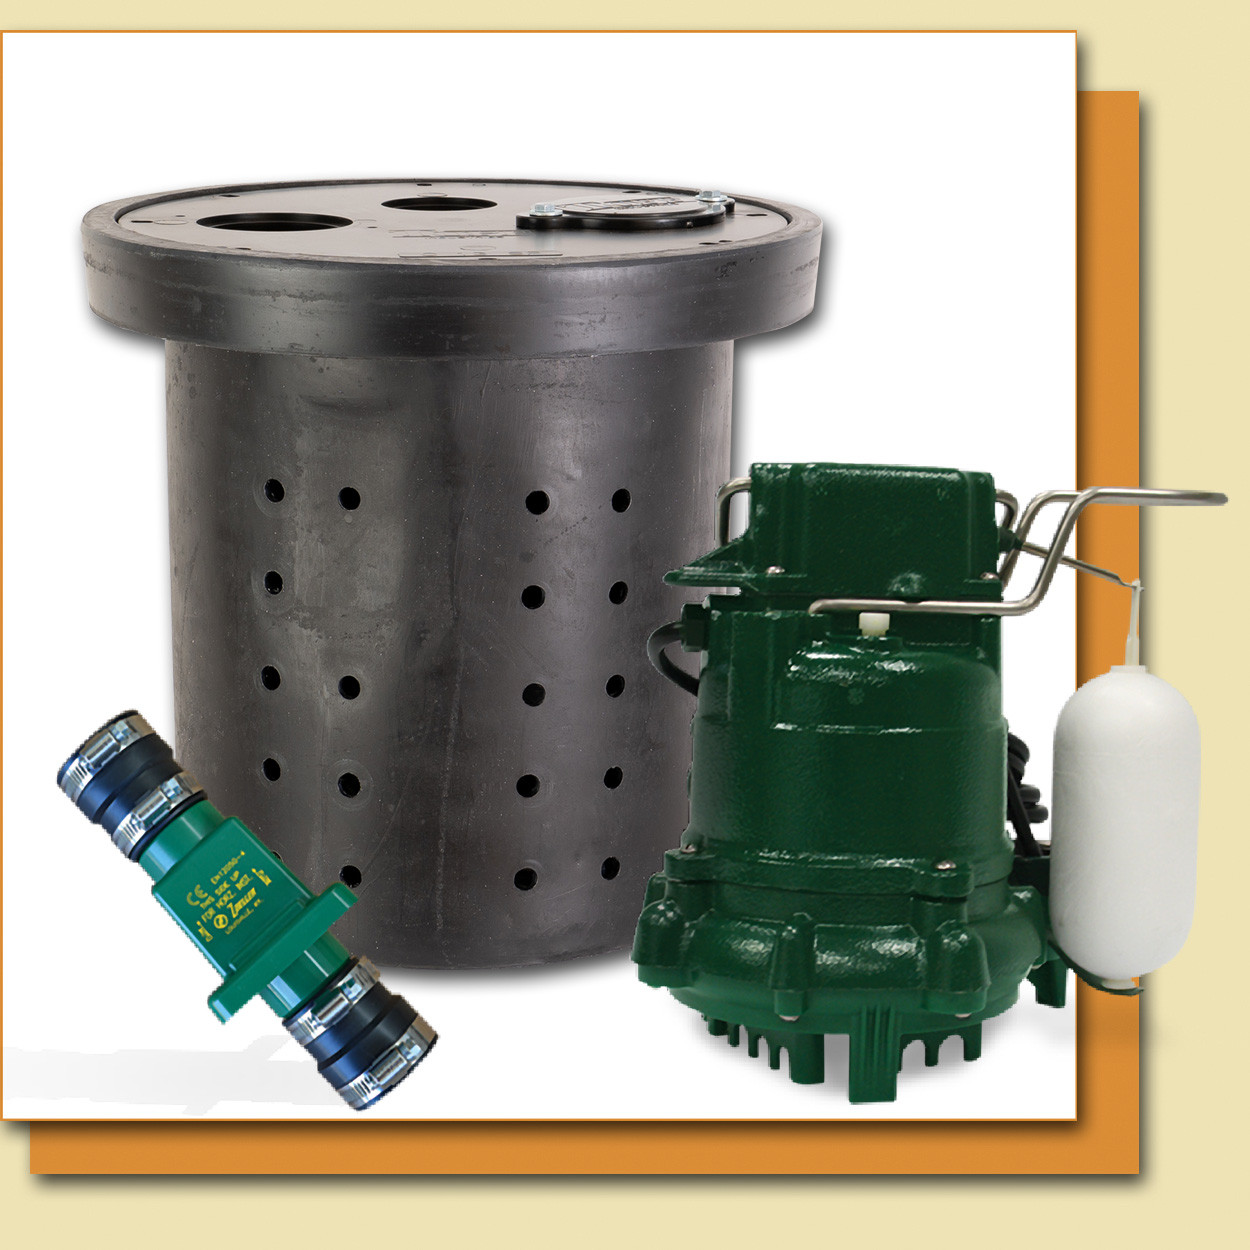 zoeller sump pumps home depot zoeller model 53 basin valve [ 1250 x 1250 Pixel ]